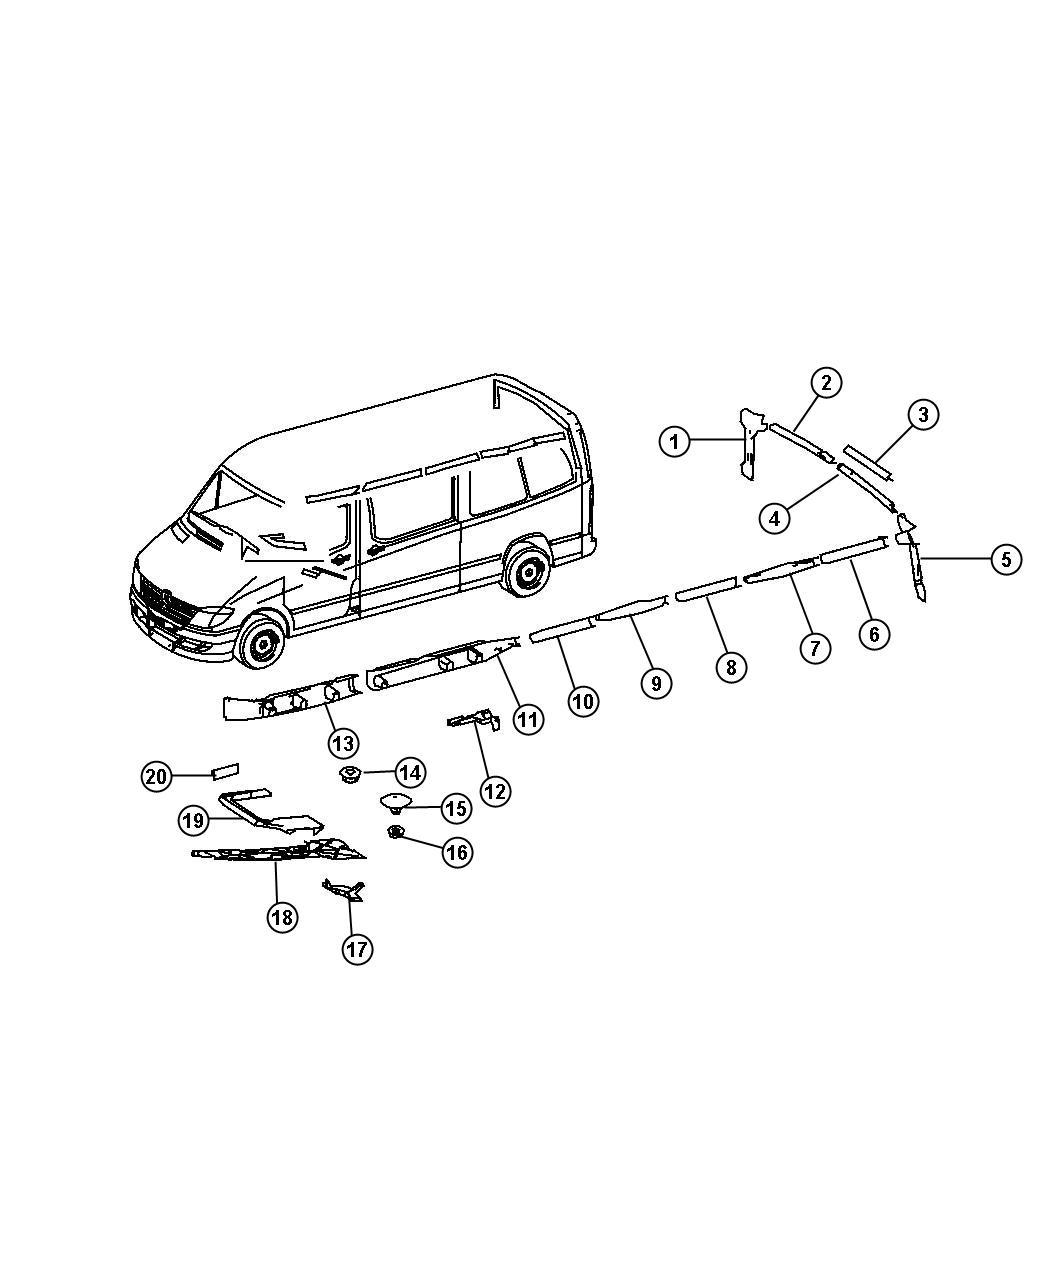 Dodge Sprinter Shield  Wiring  T19  With  Lt Sliding Door